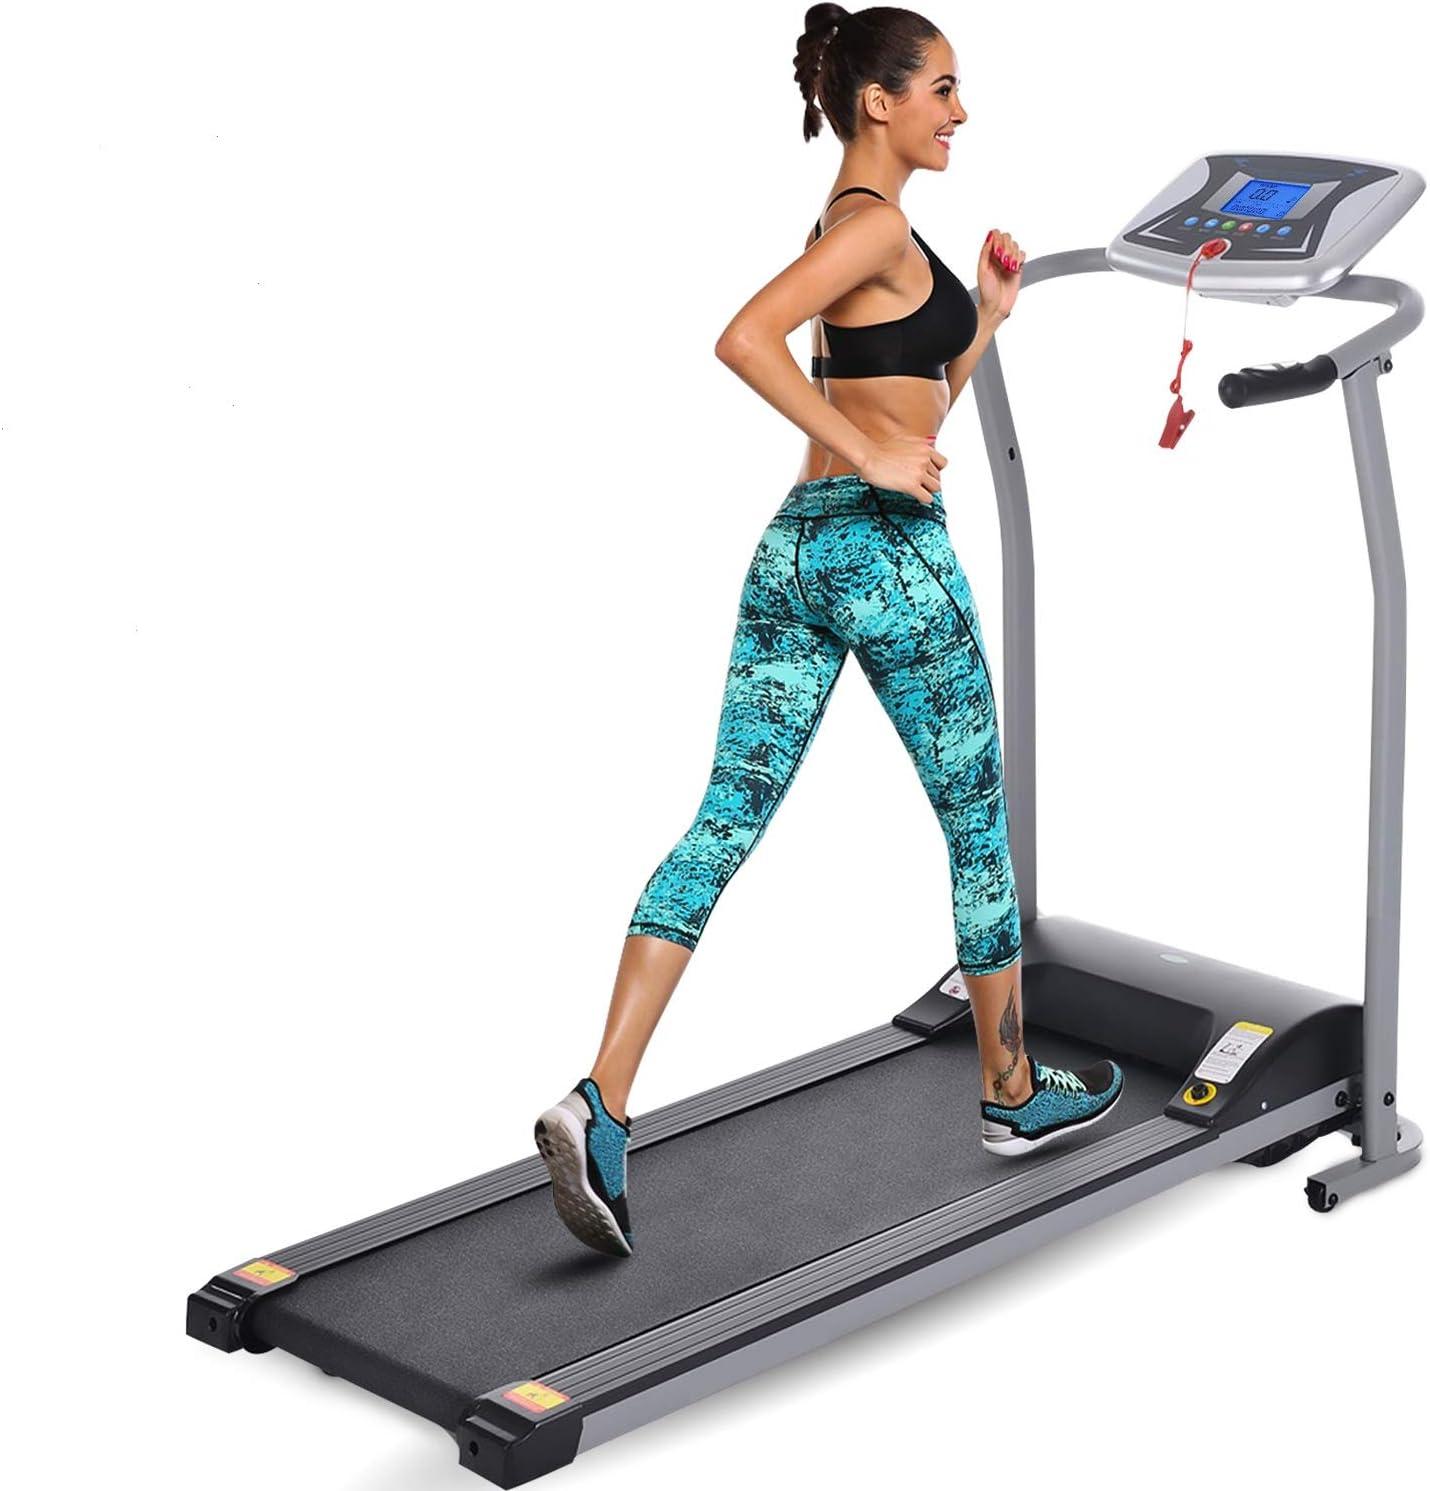 Mauccau Folding Treadmill Boston Mall Electric Machine Motorized Running Recommended Por